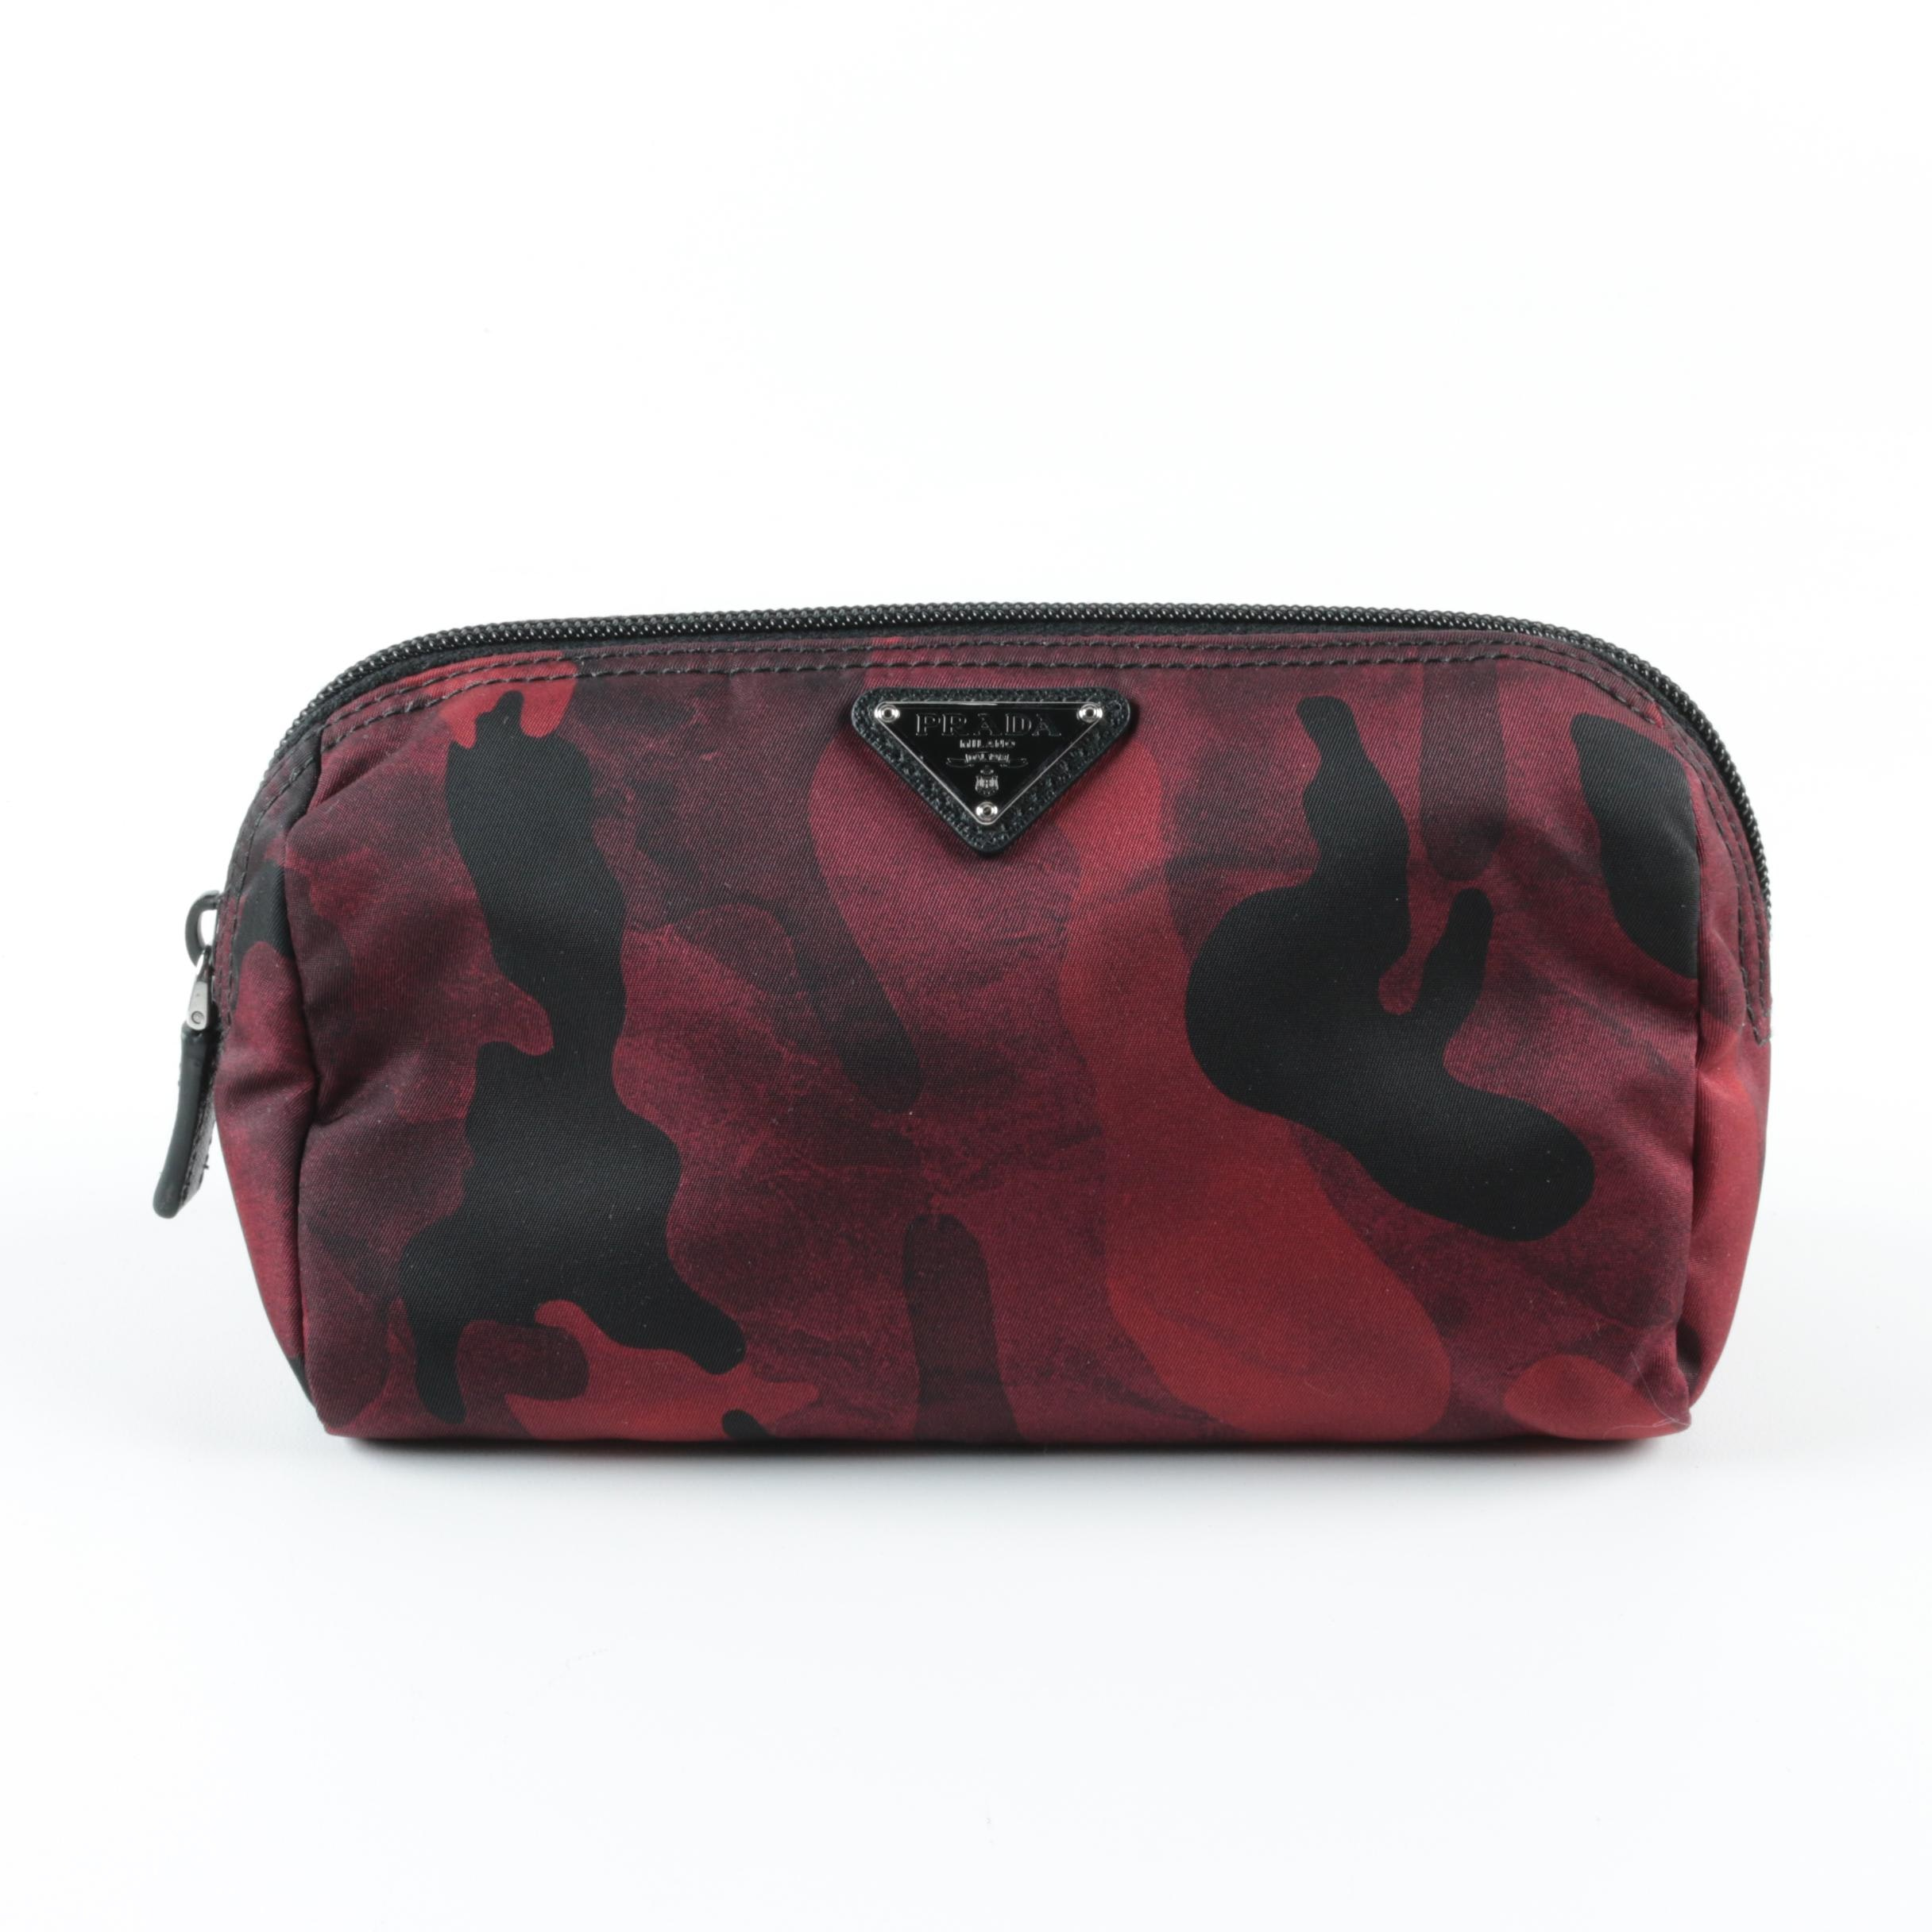 Prada Camouflage Cosmetics Bag